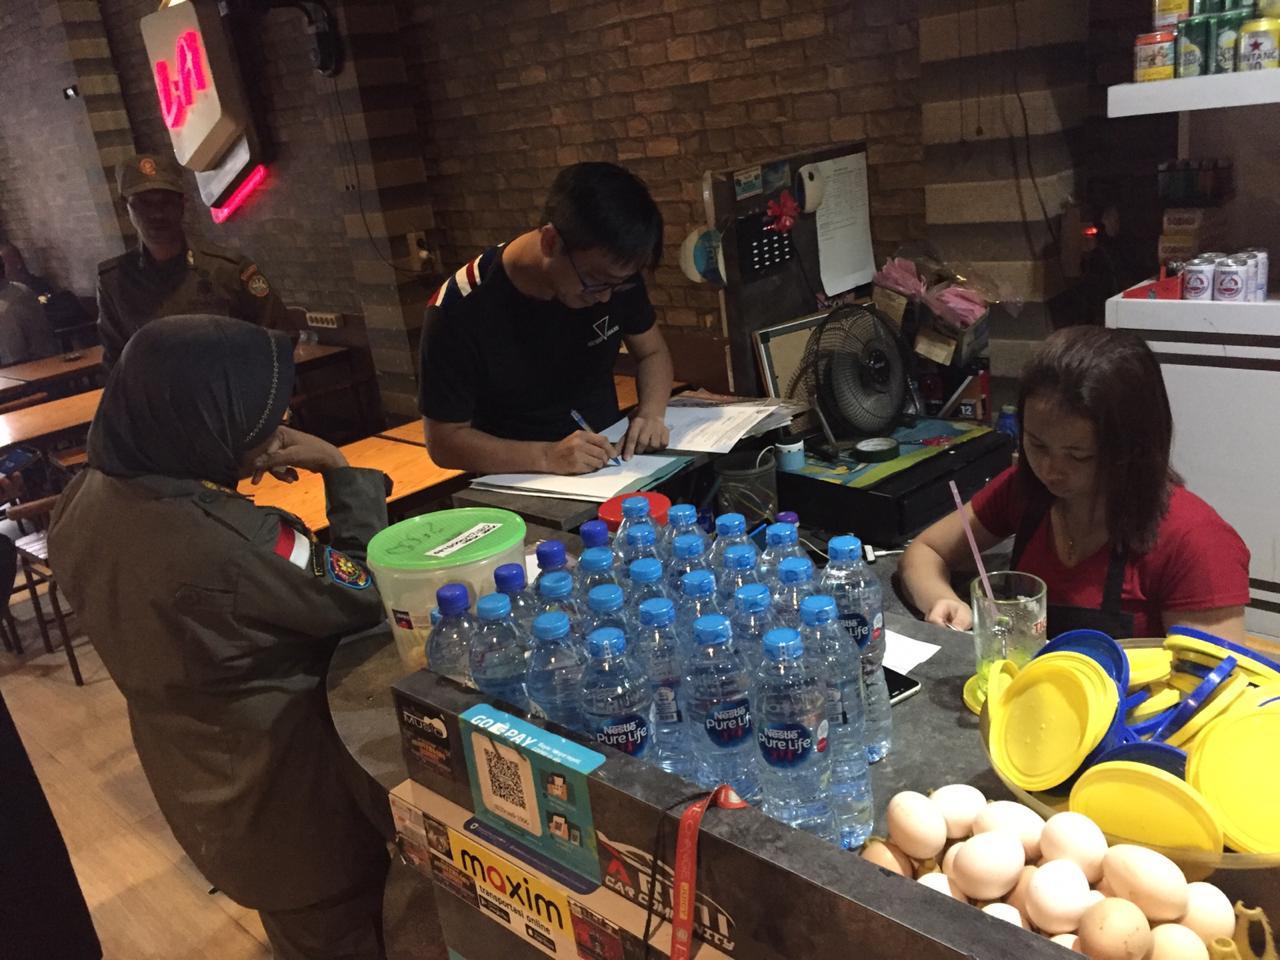 Petugas Satpol PP Kota Pontianak melakukan penyisiran ke warkop dan cafe yang ada di Kota Pontianak, Jumat (20/03/2020)